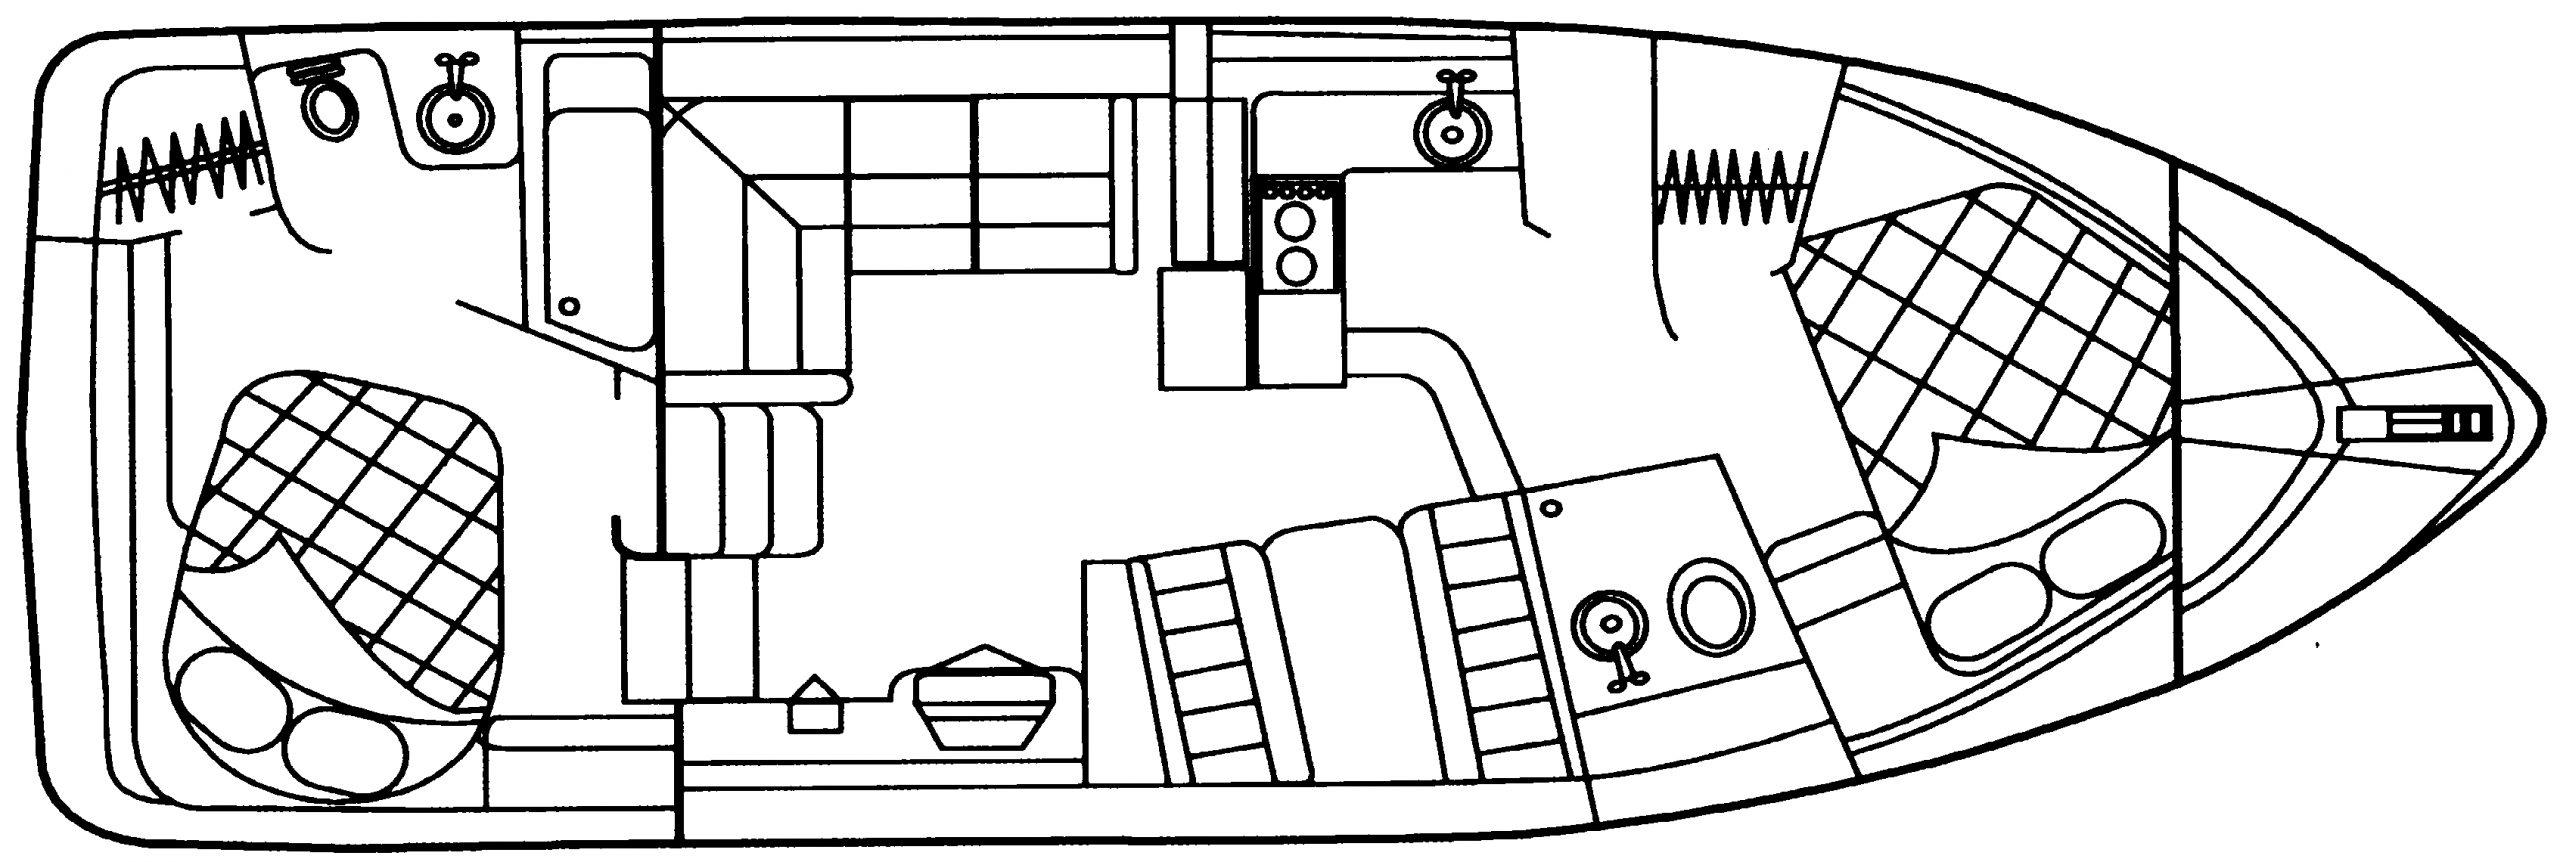 3650-3750 Motor Yacht; 375 Motor Yacht Floor Plan 1